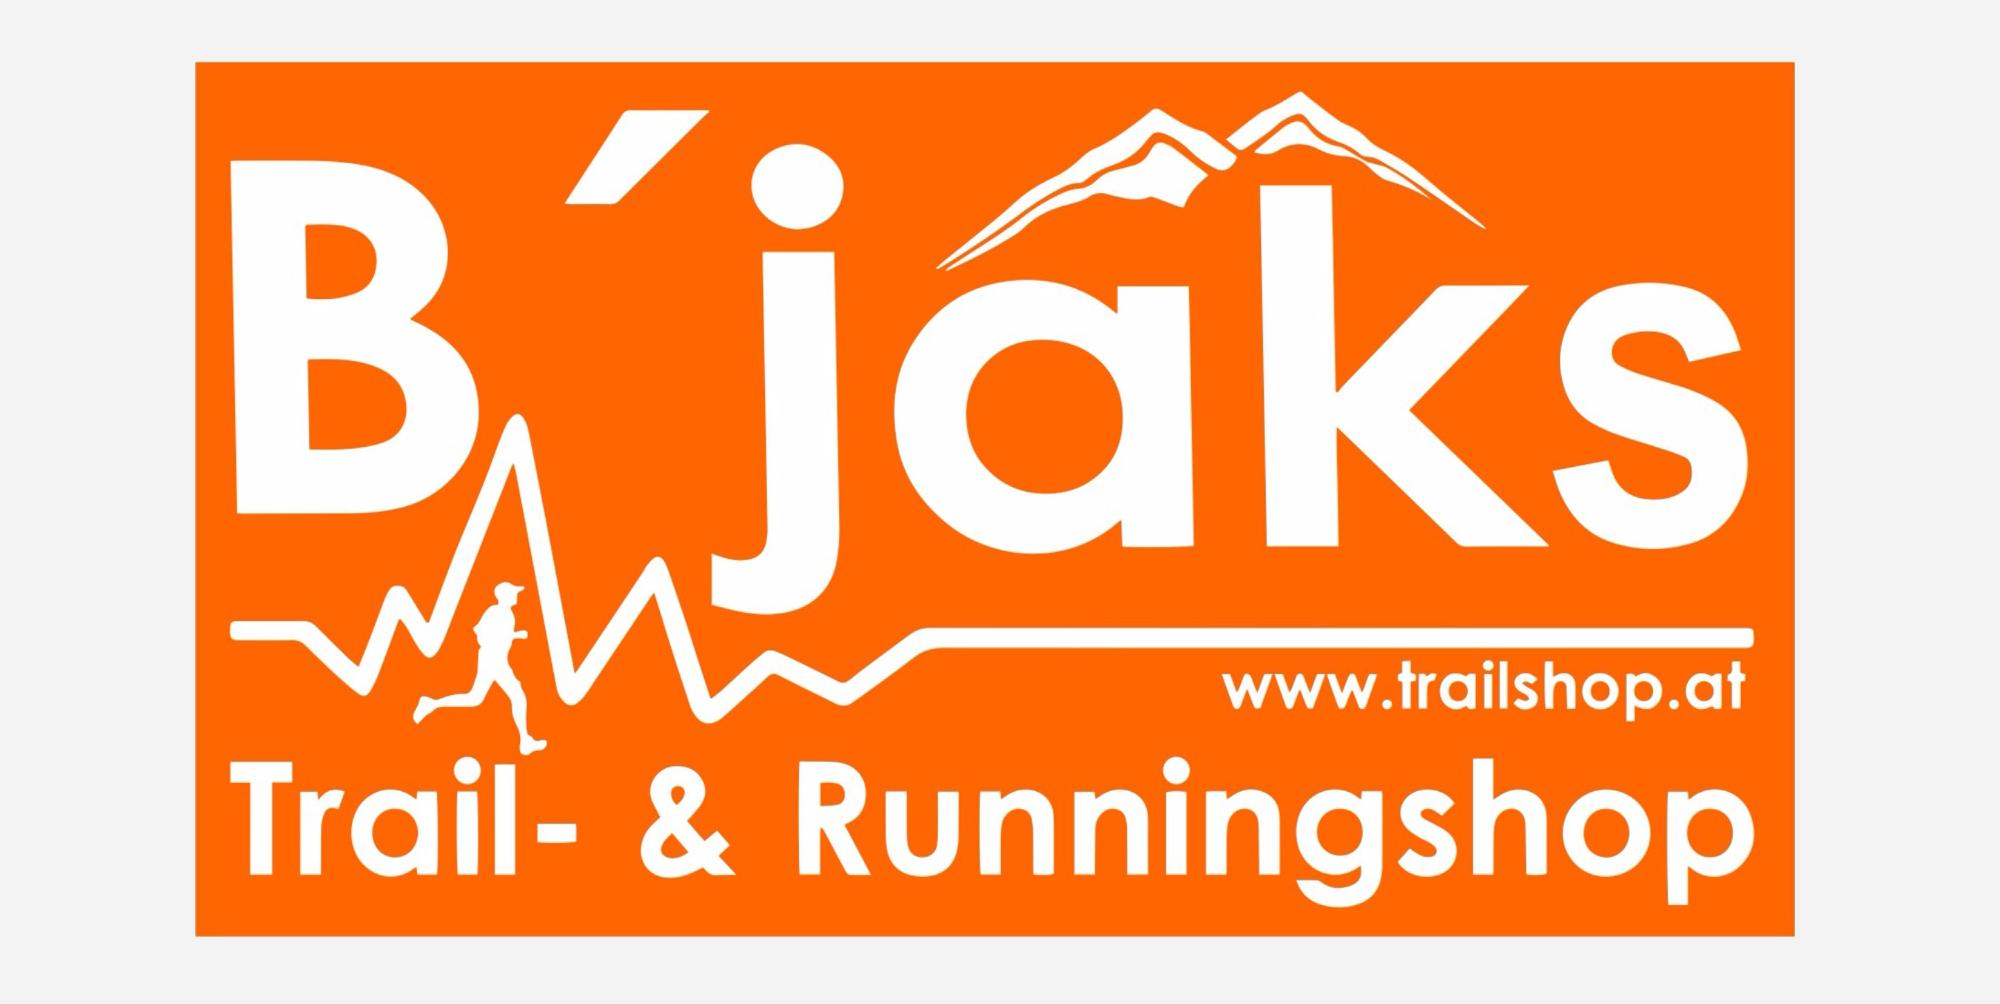 B'jaks Trail- & Runningshop